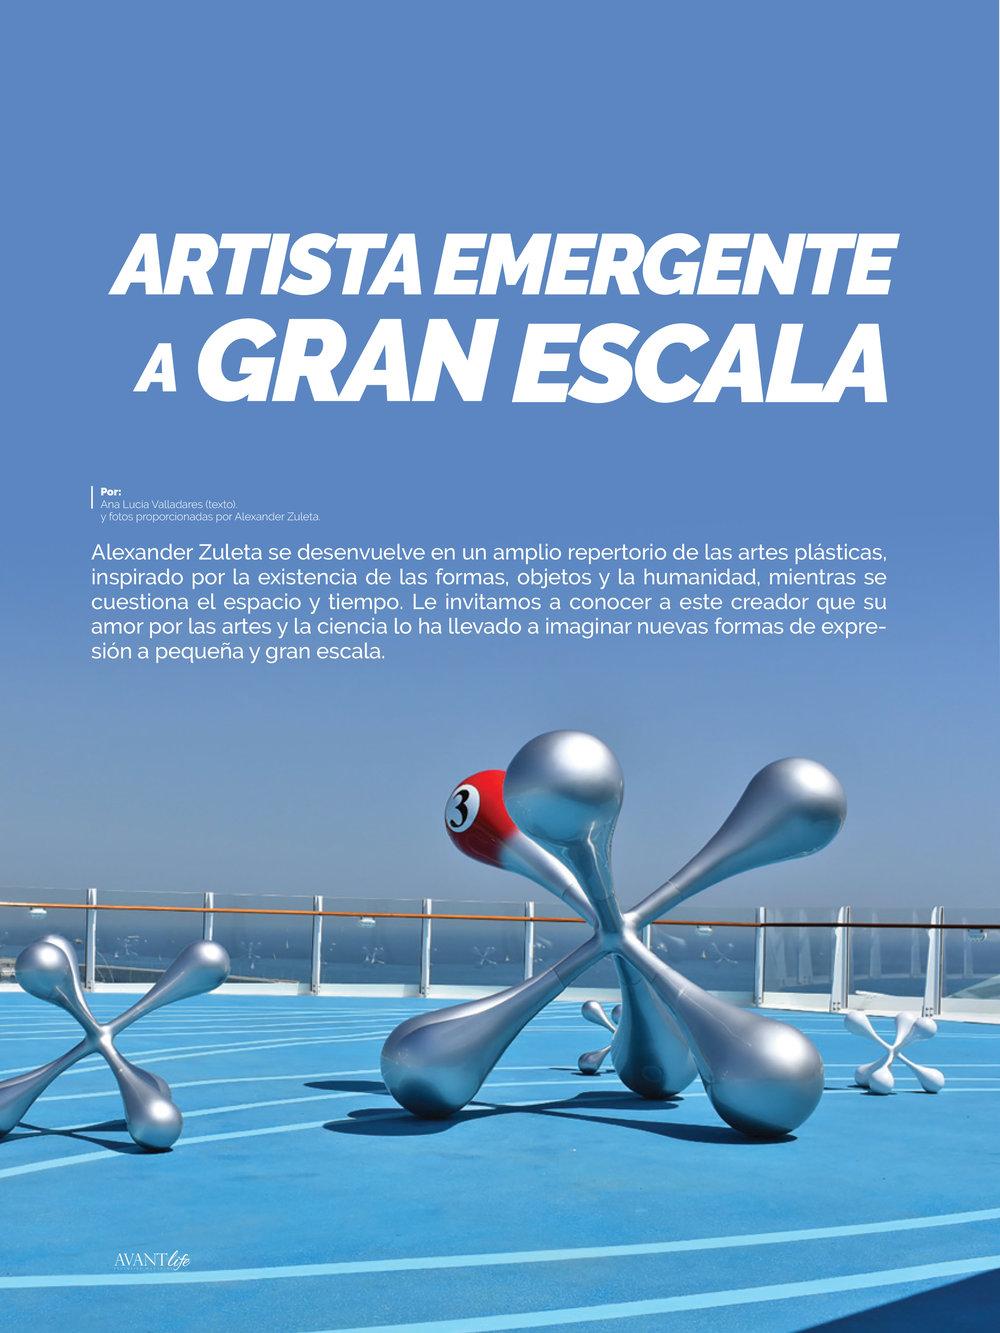 Art-Artista-Emergente-1.jpg